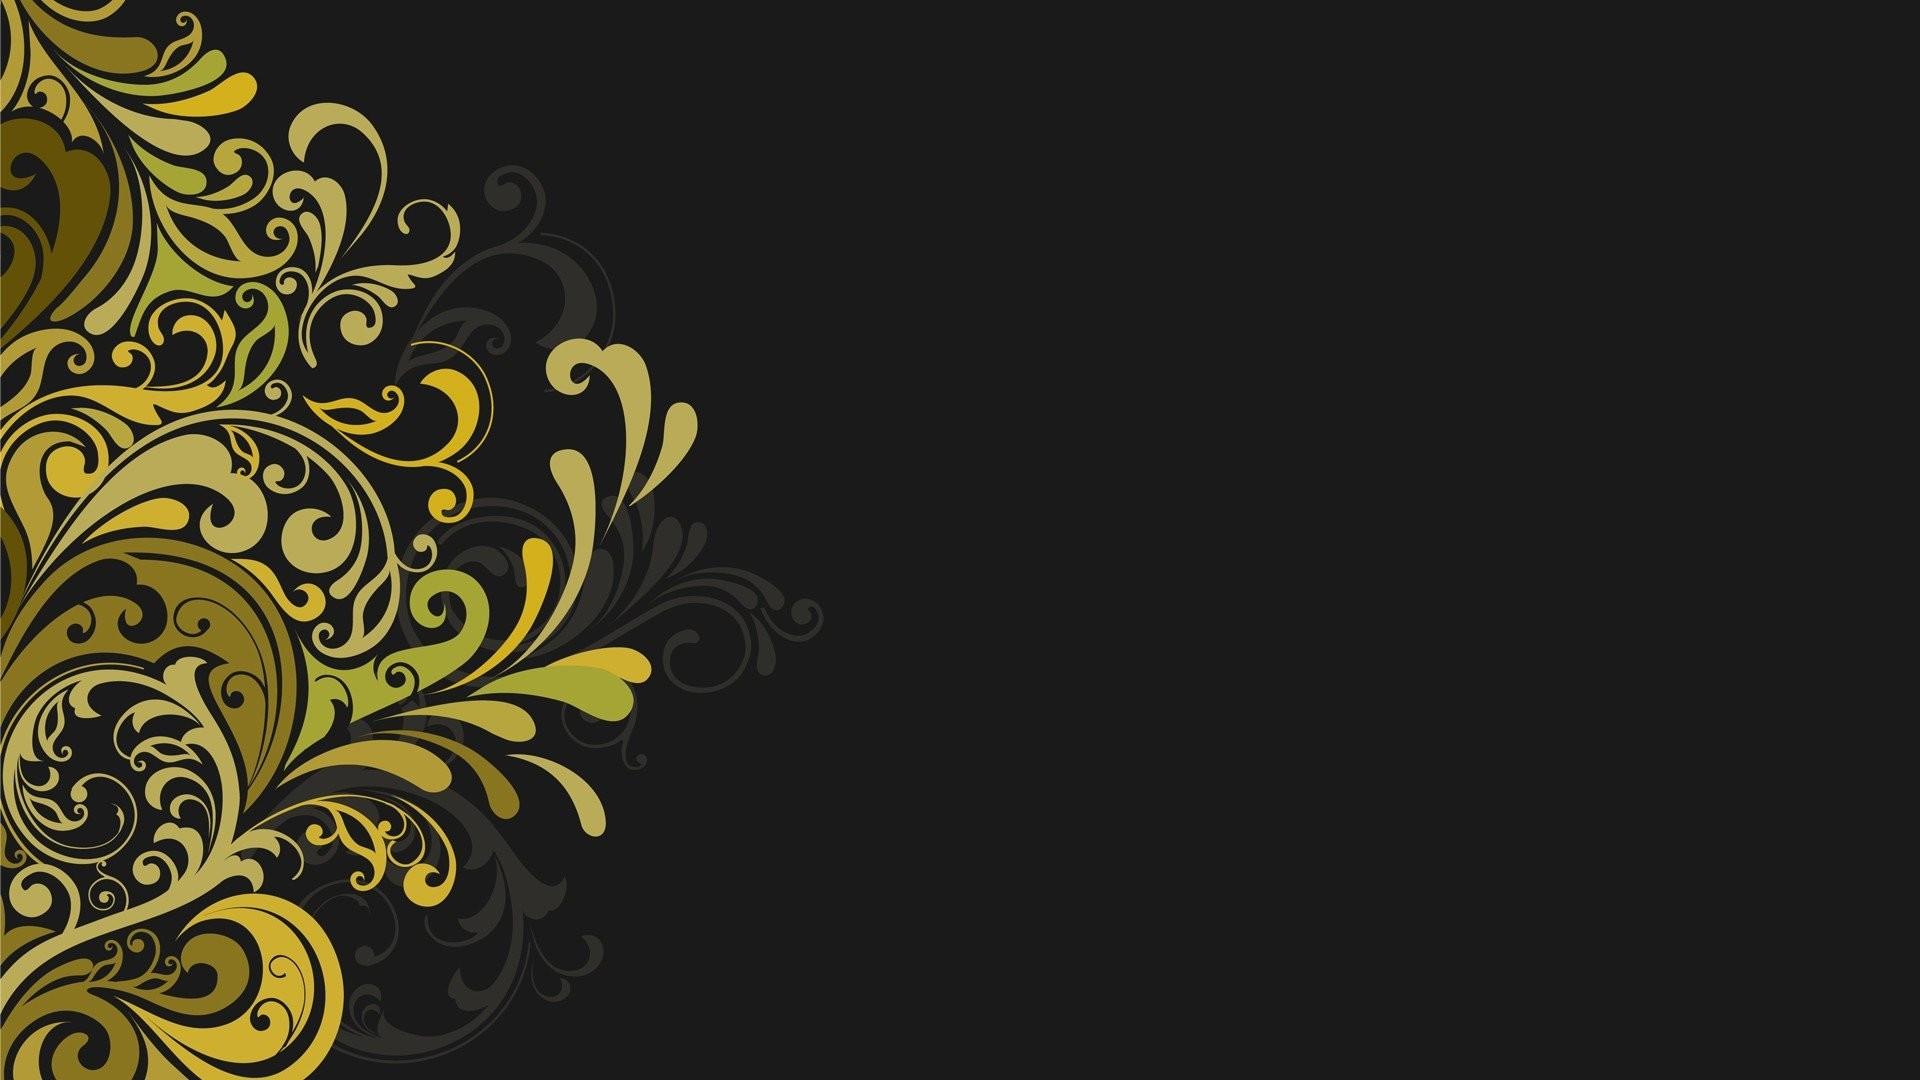 Res: 1920x1080, Vectors floral graphics grey background wallpaper |  | 320887 |  WallpaperUP